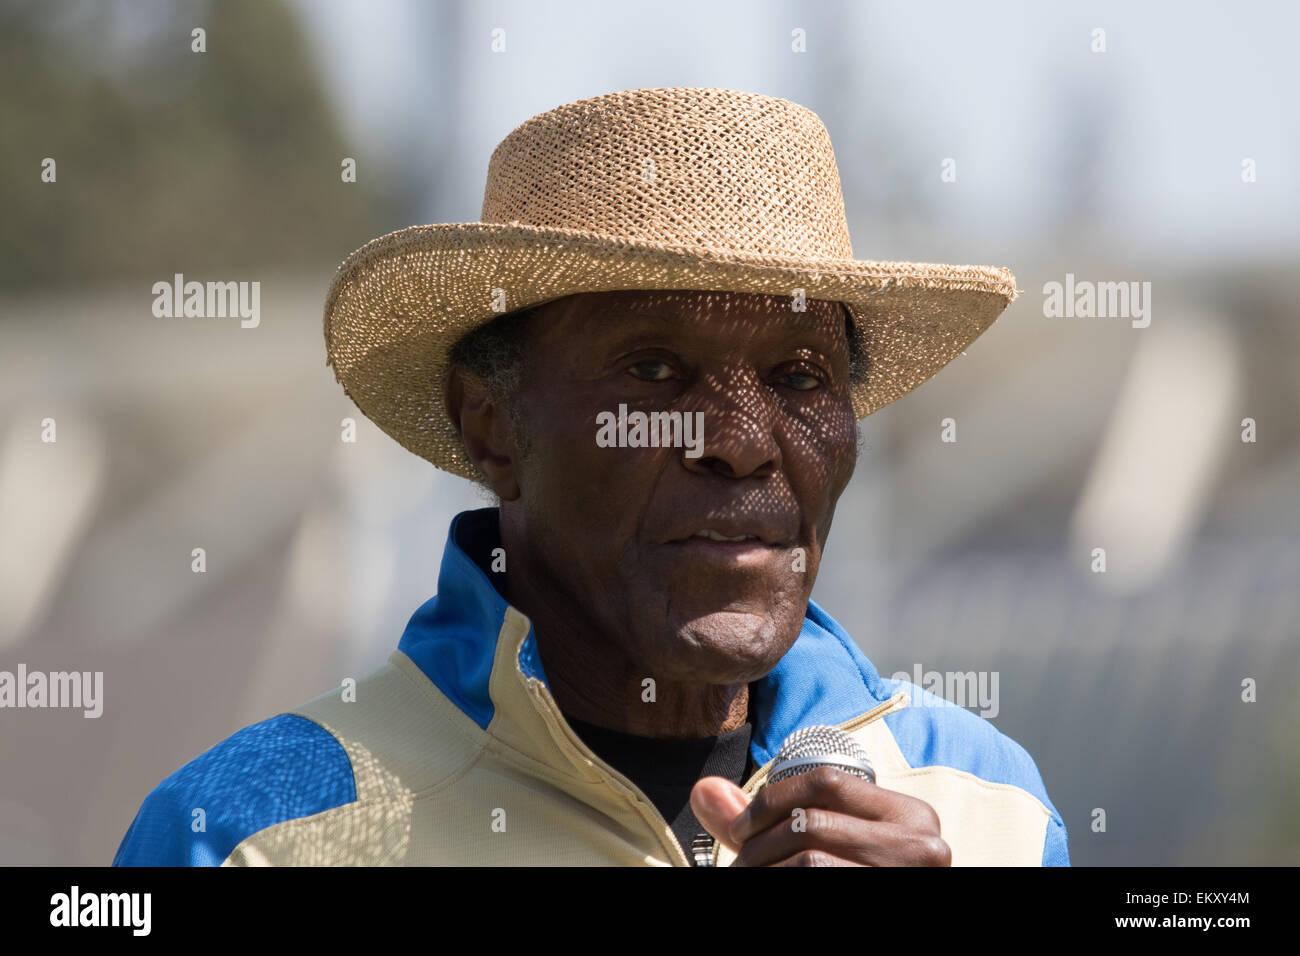 Rafer Lewis Johnson  At the 2015 Rafer Johnson/Jackie Joyner-Kersee Invitational Drake Stadium UCLA 1960 Olympic - Stock Image